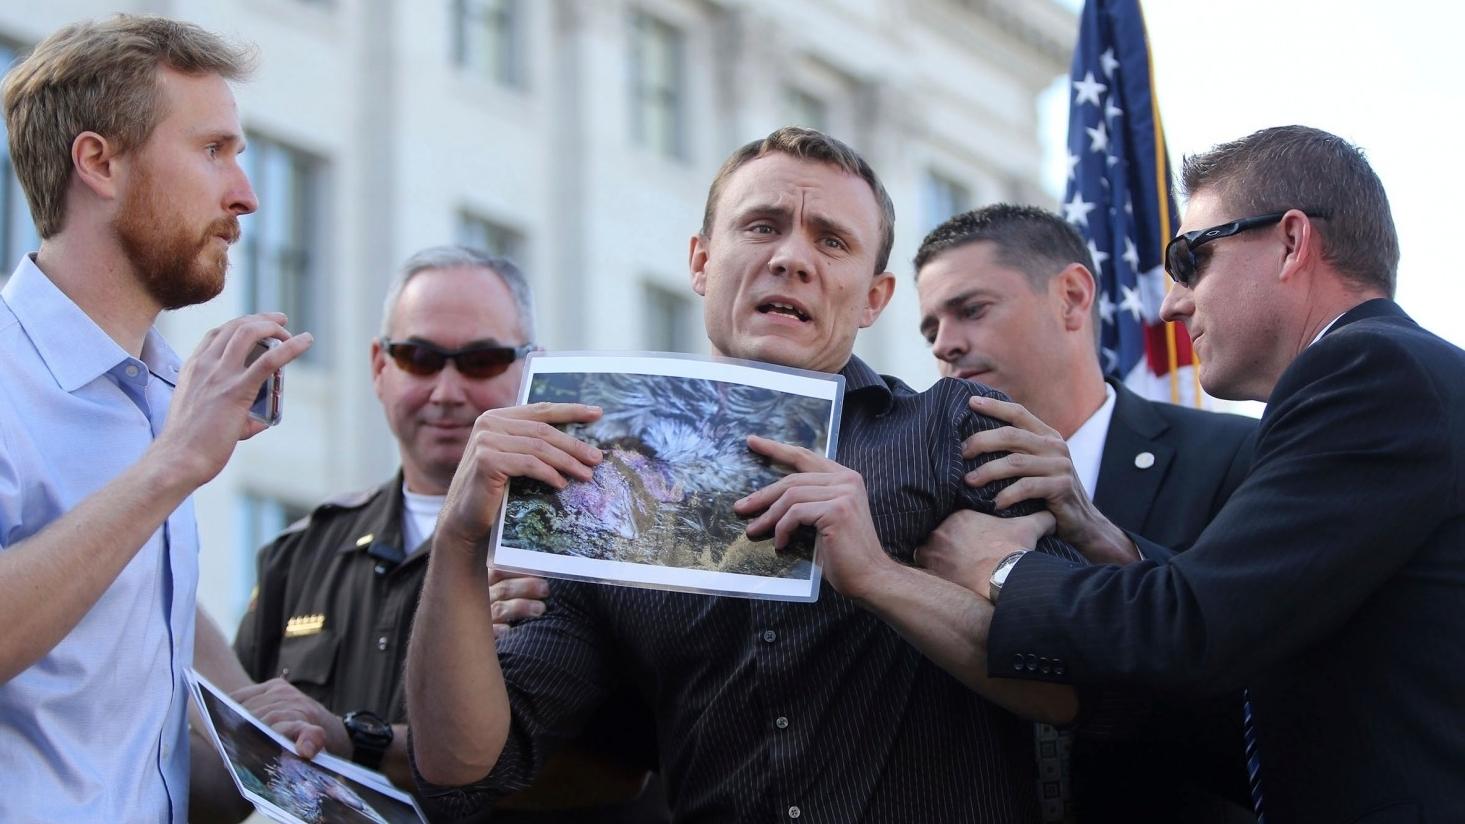 Animal activists disrupt Utah governor's turkey pardon - November 22, 2017New York Post